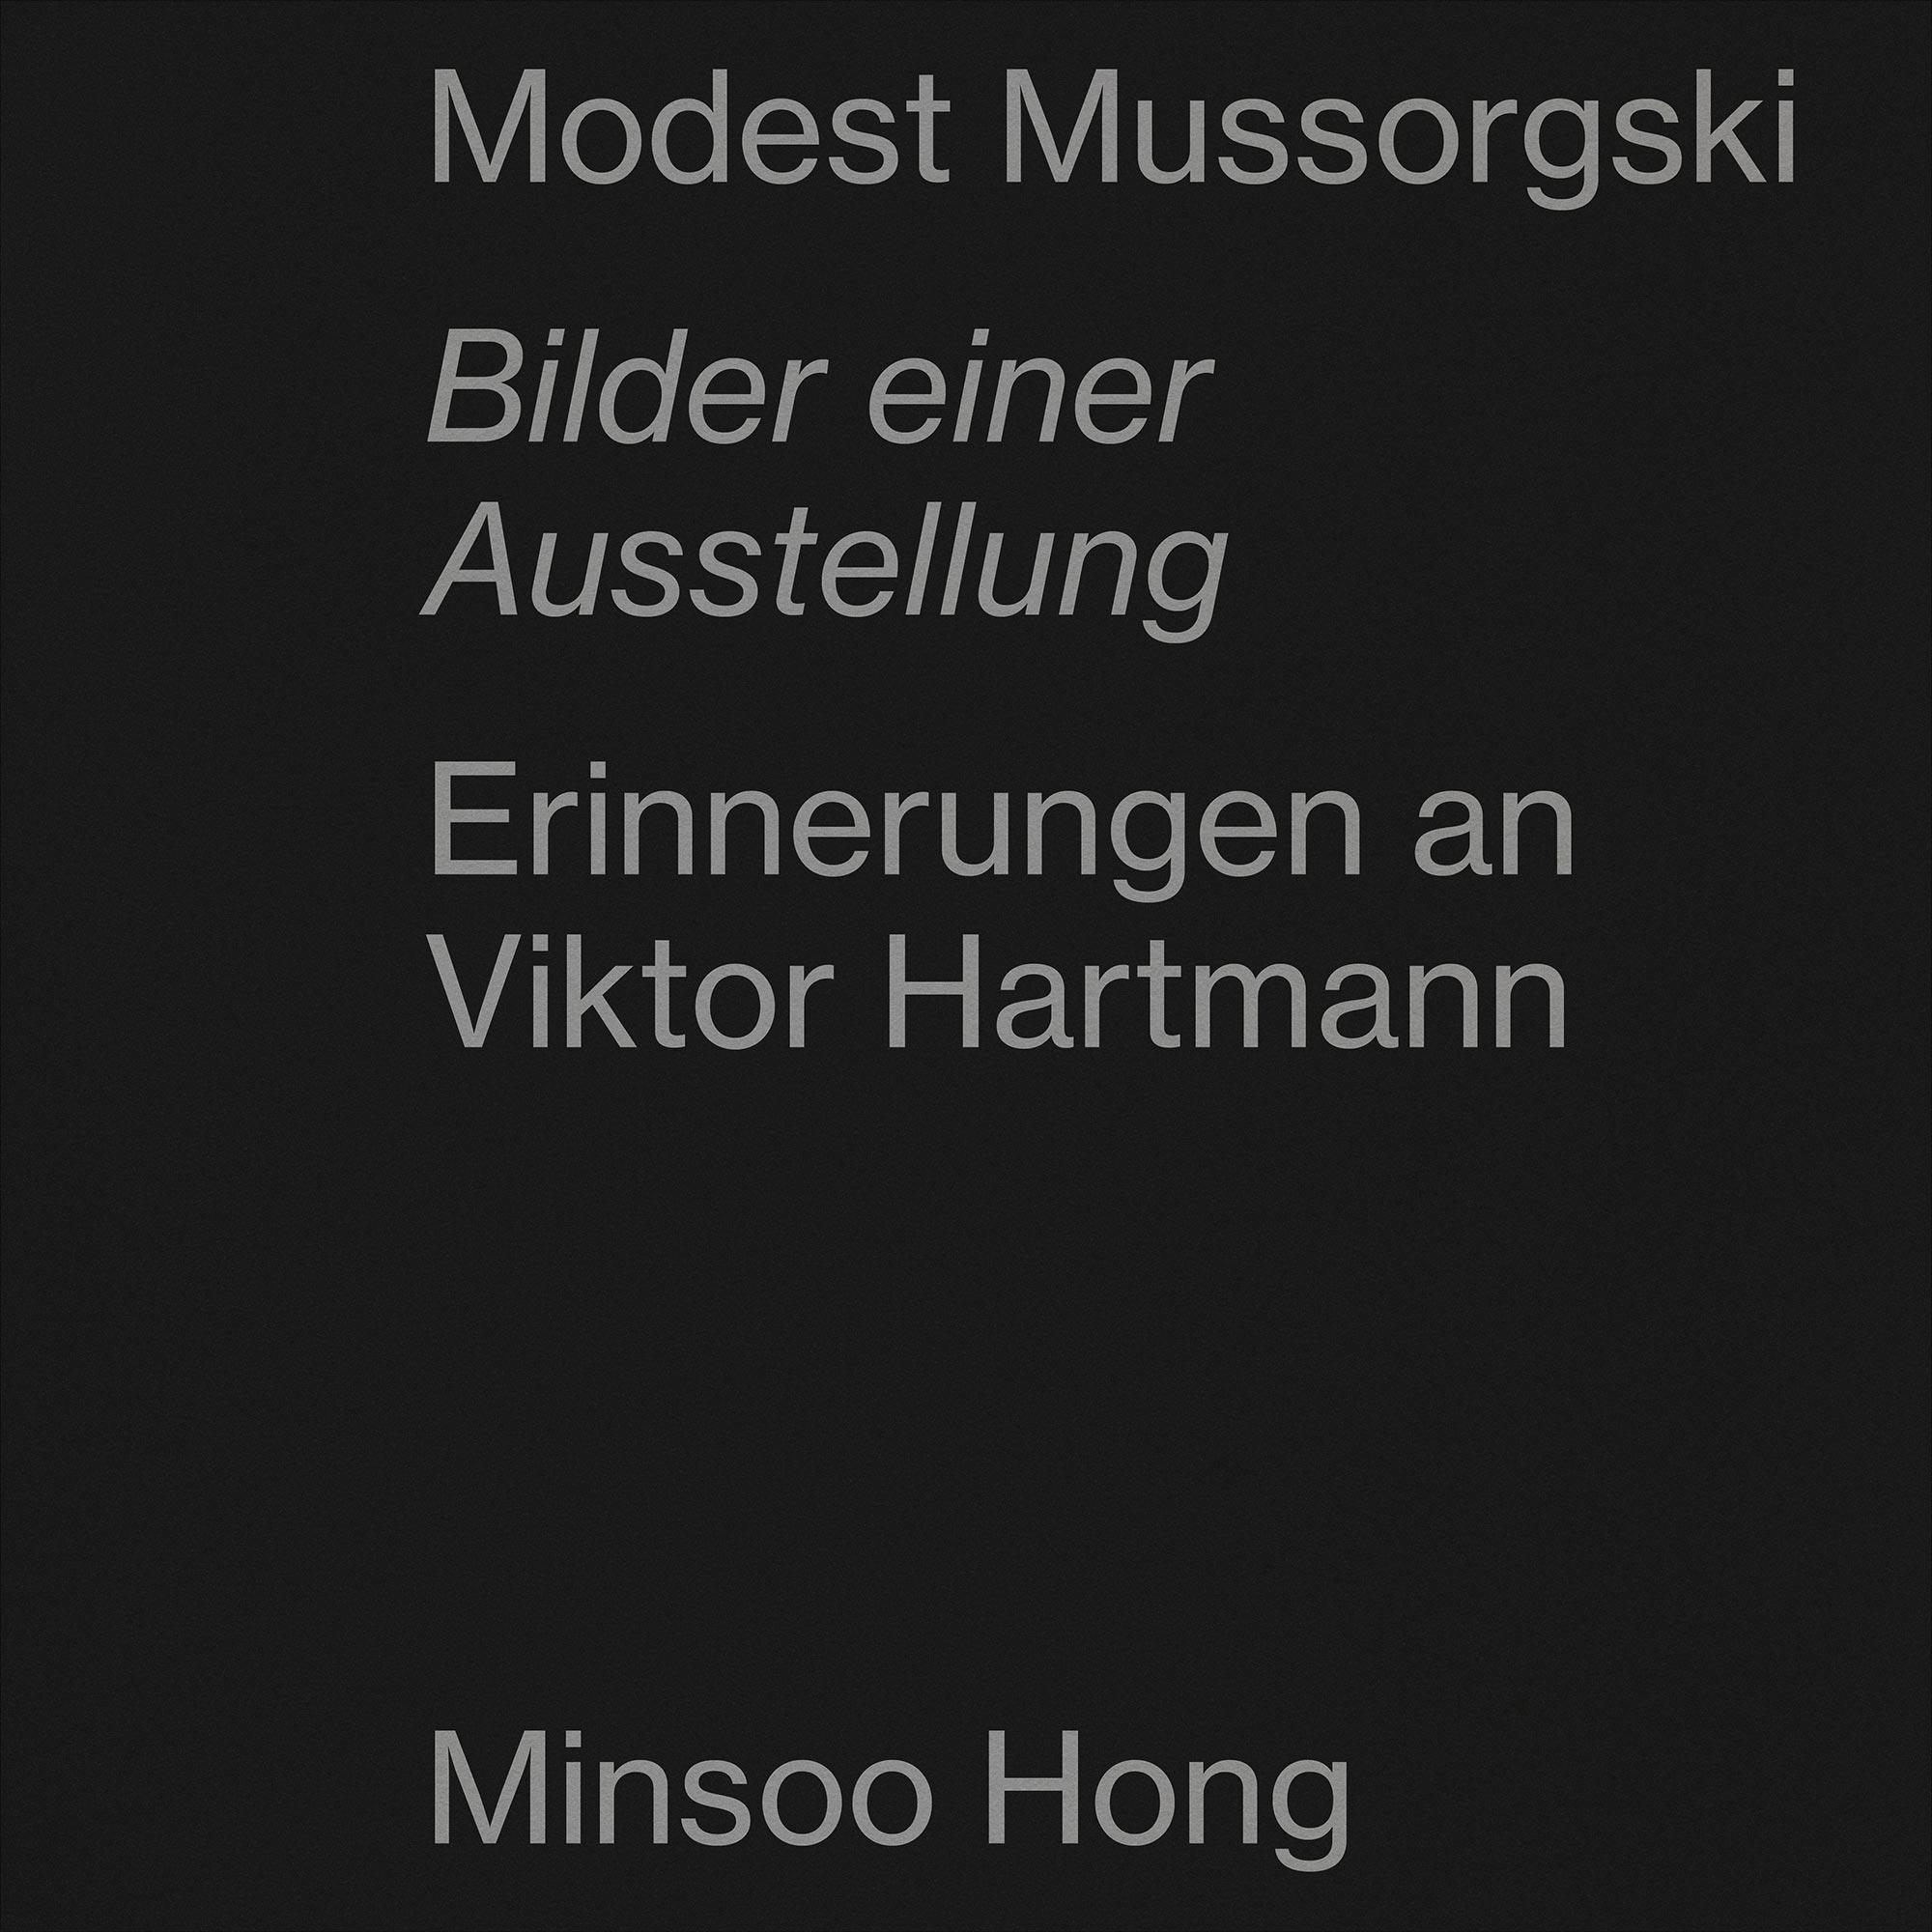 Mussorgsky 1